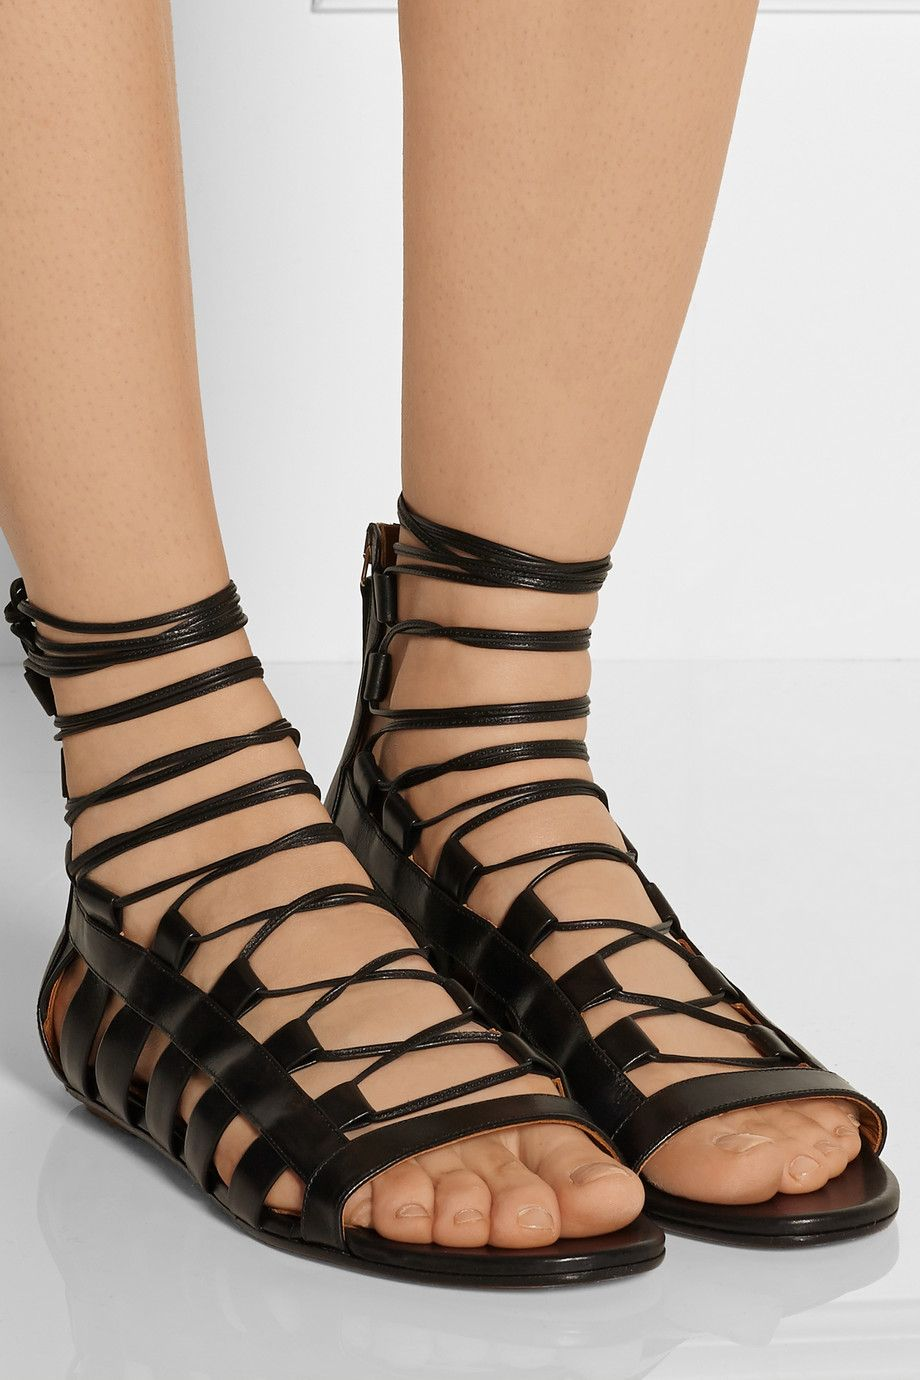 Aquazzura Amazon Leather Sandals Net A Porter Com Leather Sandals Sandals Womens Sandals Flat [ 1380 x 920 Pixel ]